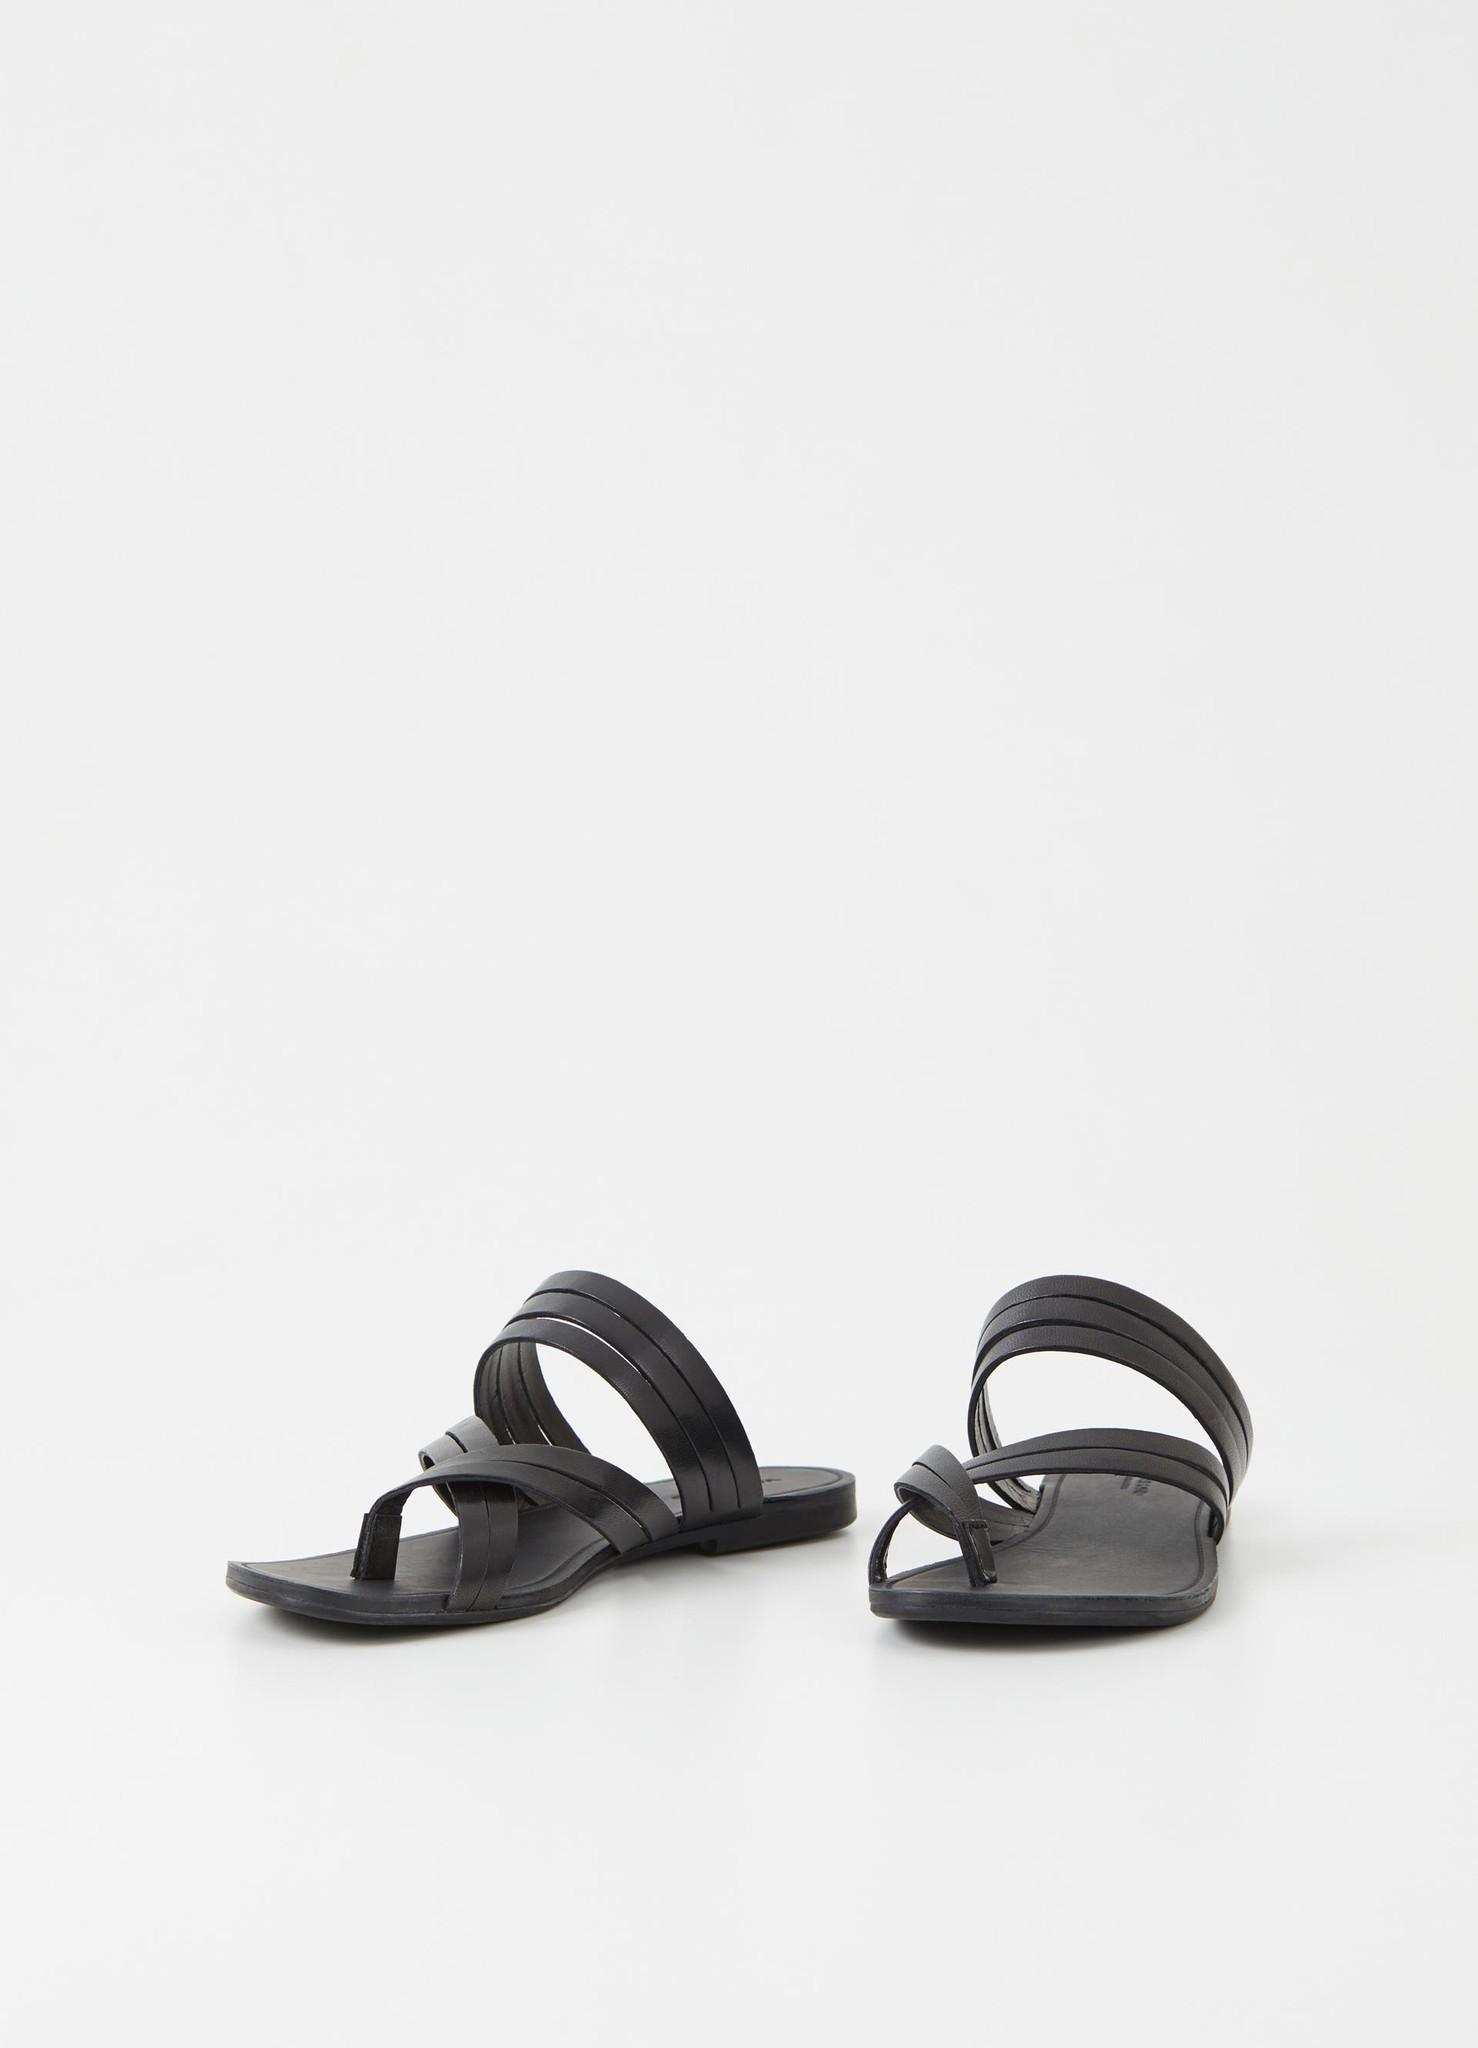 Tia Low Black Leather Sandals-3